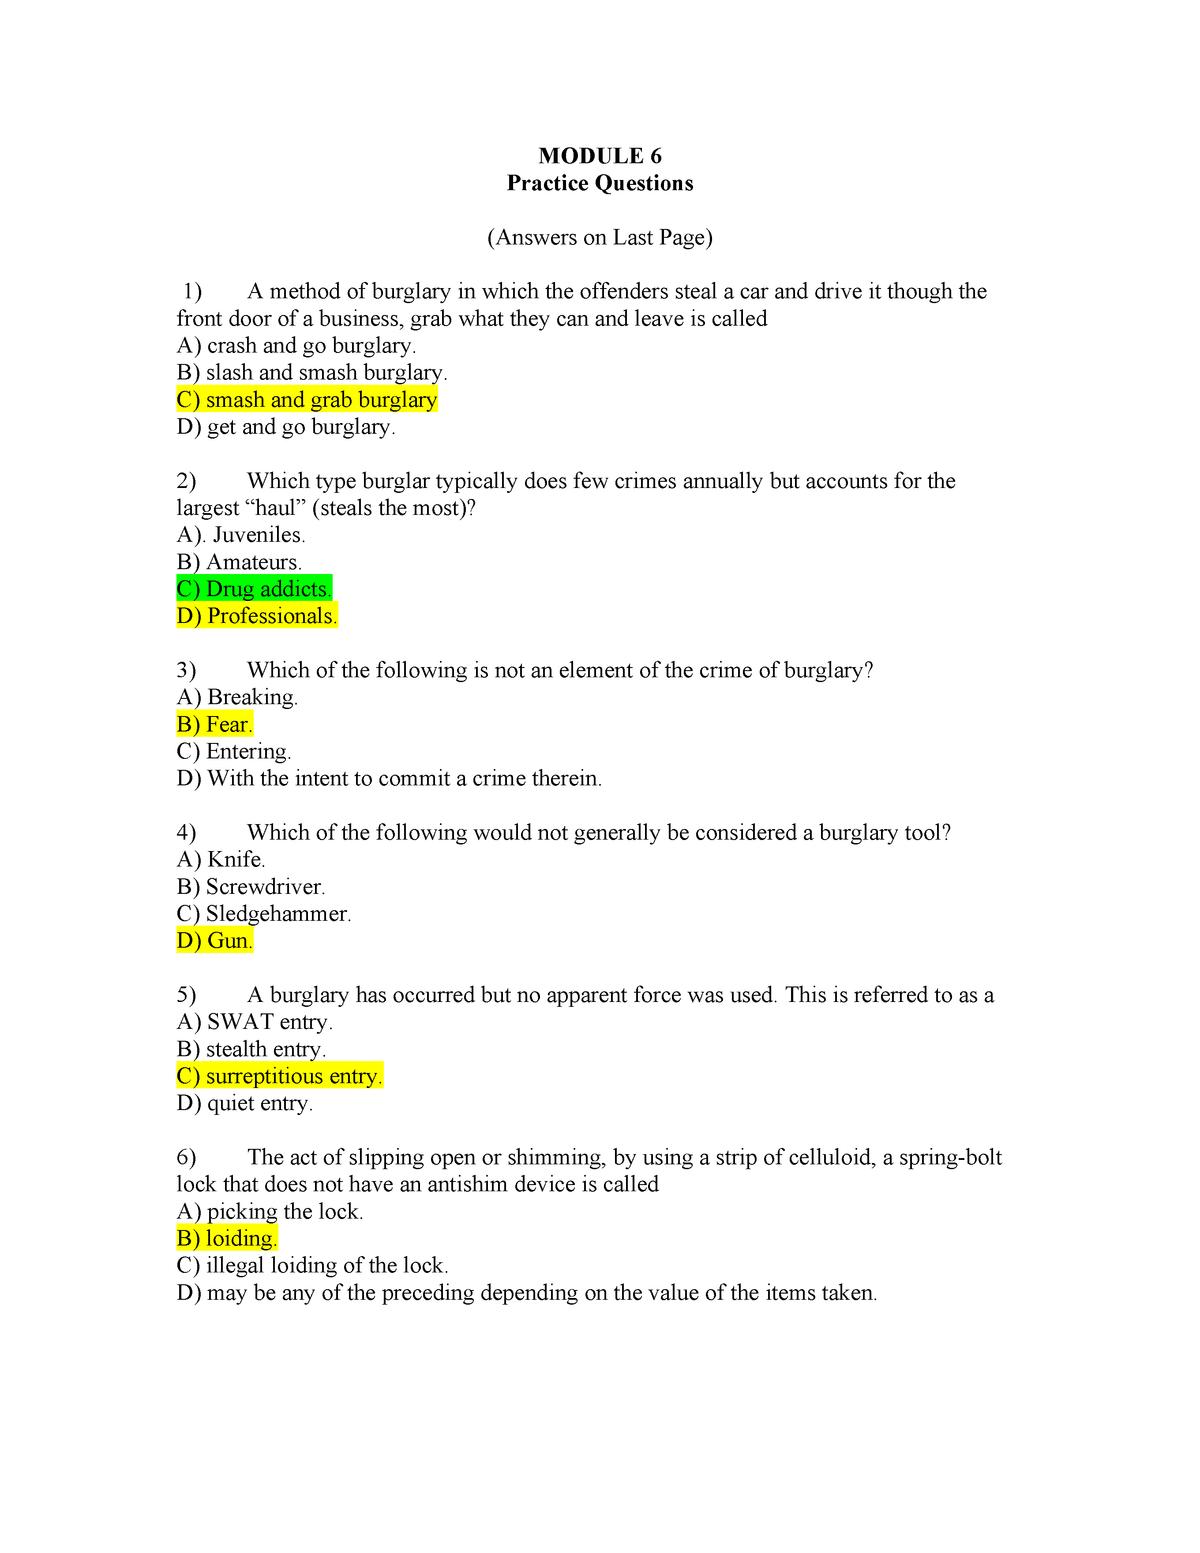 Exam 2016 - CRJU 3400: Criminal Investigations - StuDocu